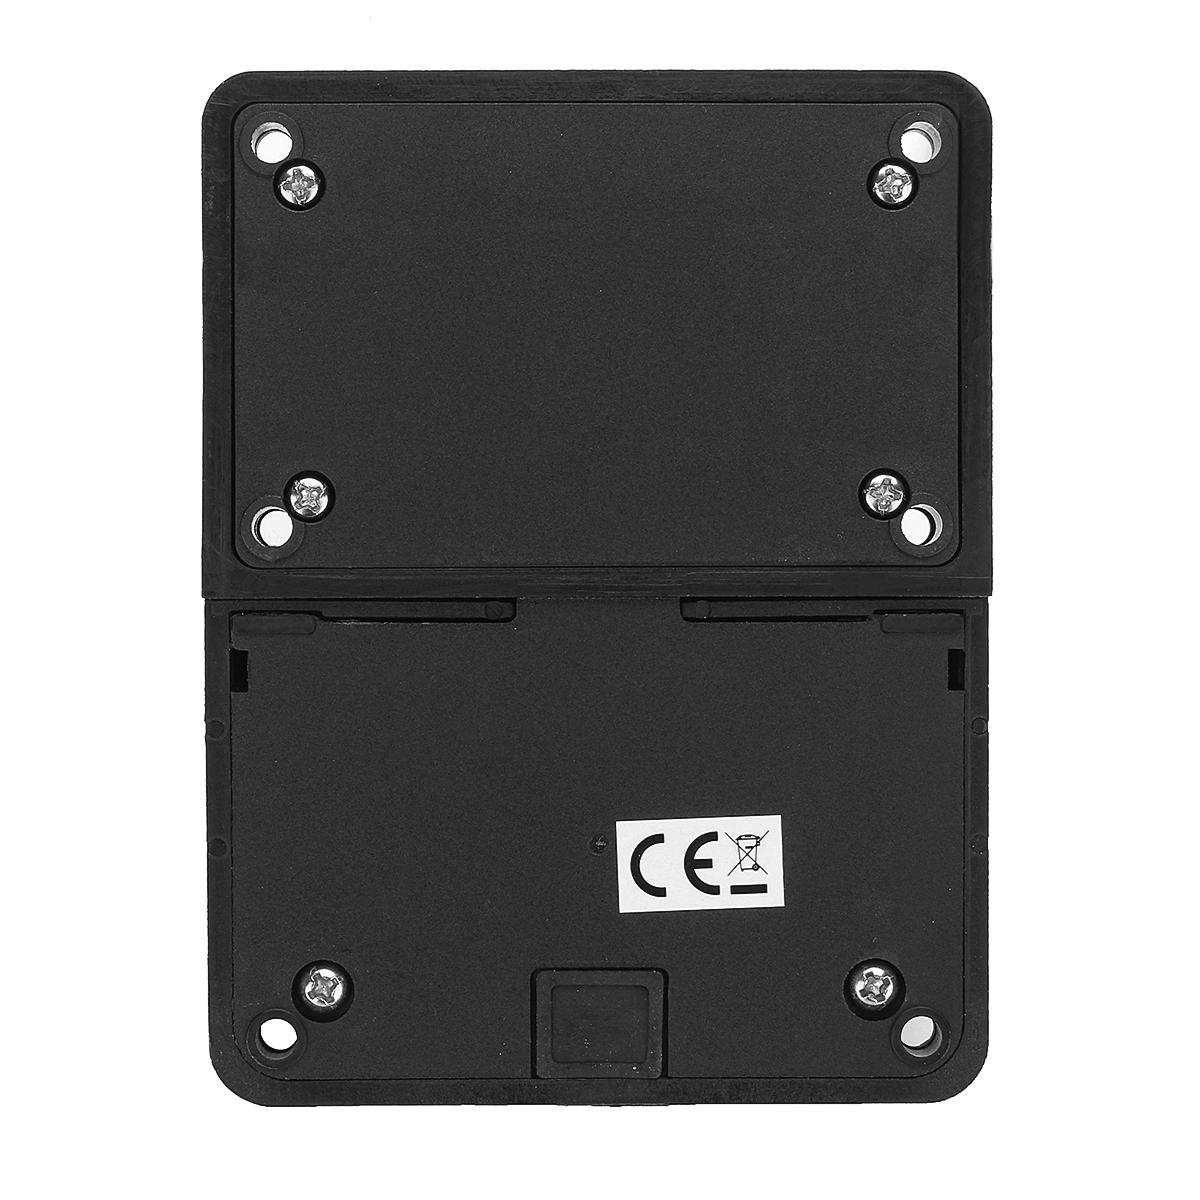 6 way blade fuse box block holder bus bar with cover kit for 32v car Emergency Brake Kit seller